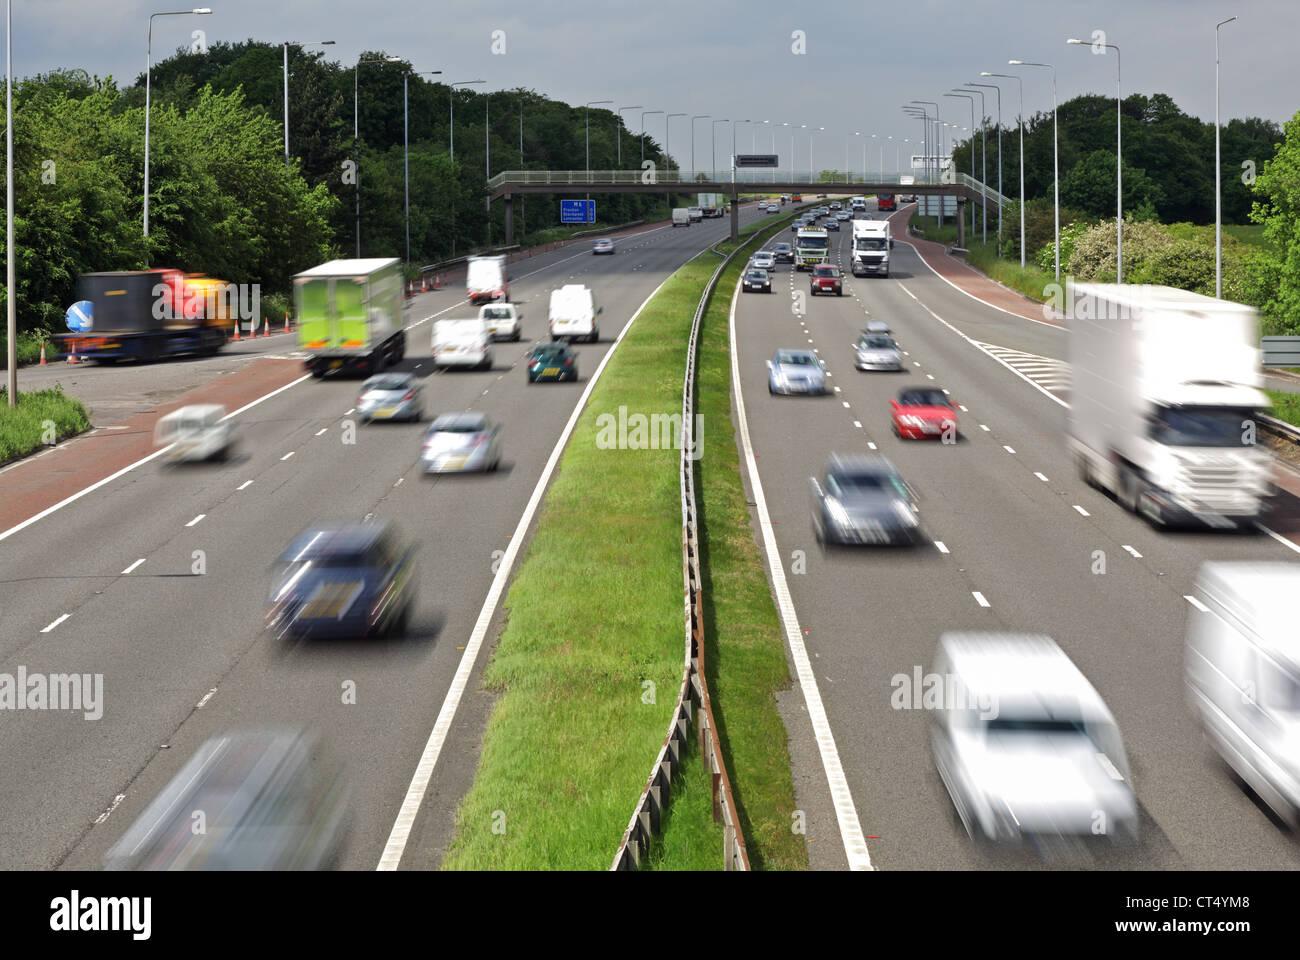 Traffico Autostradale Immagini Stock